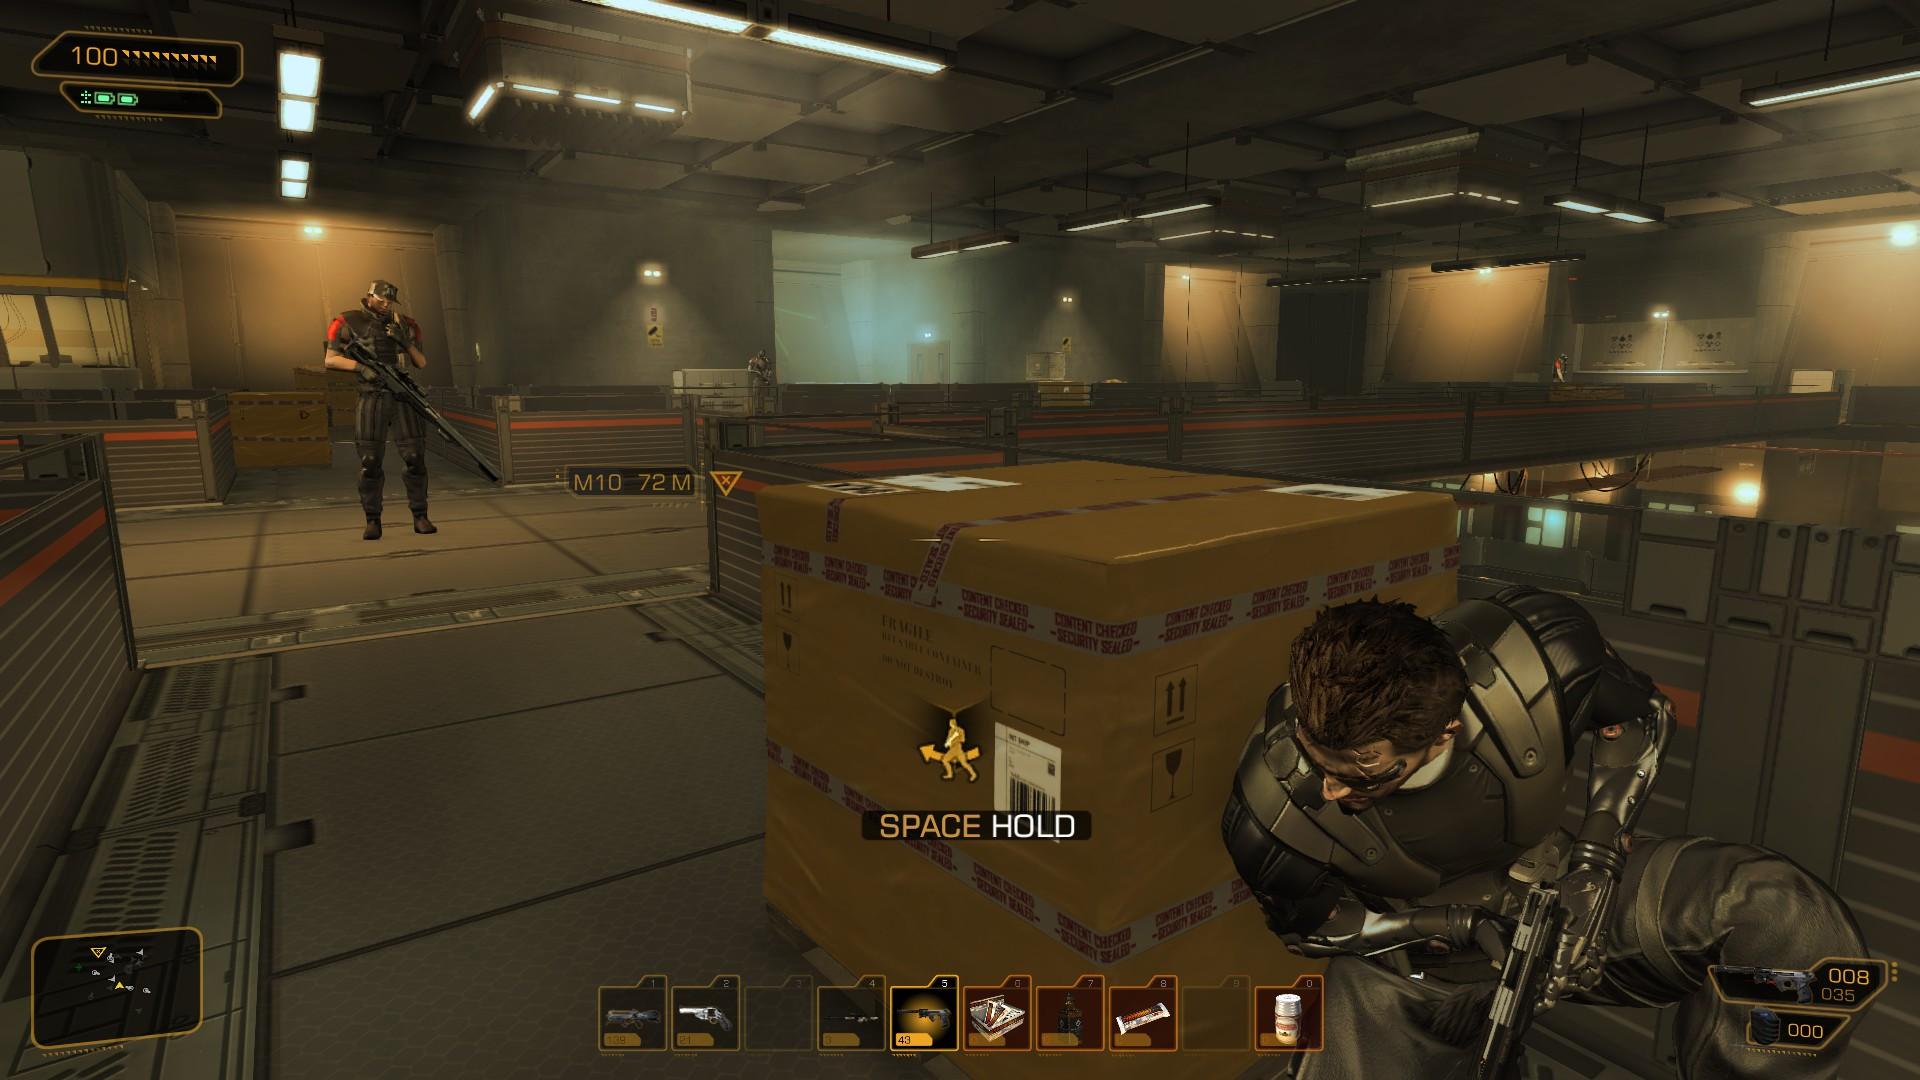 Deus Ex: Human Revolution Screenshot 1